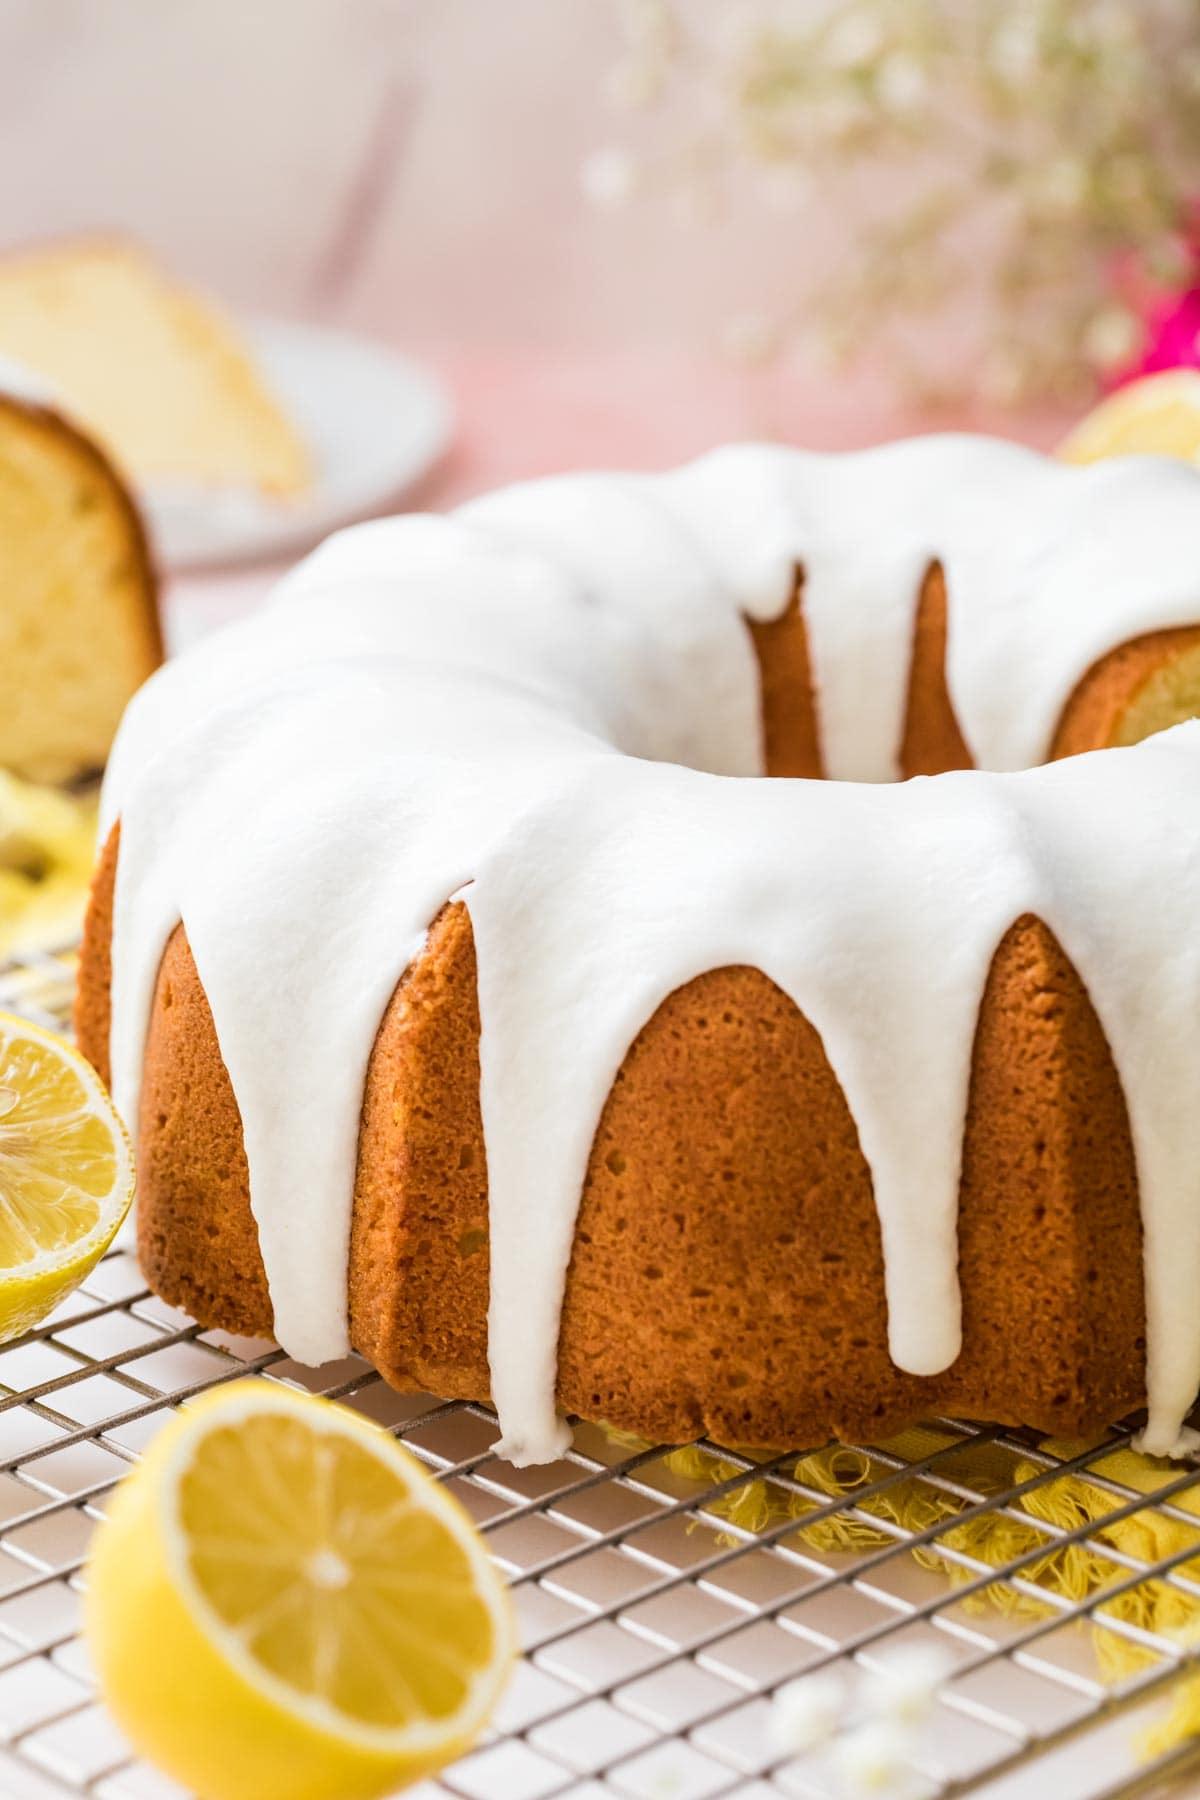 Lemon pound cake iced sitting on a cooling rack.